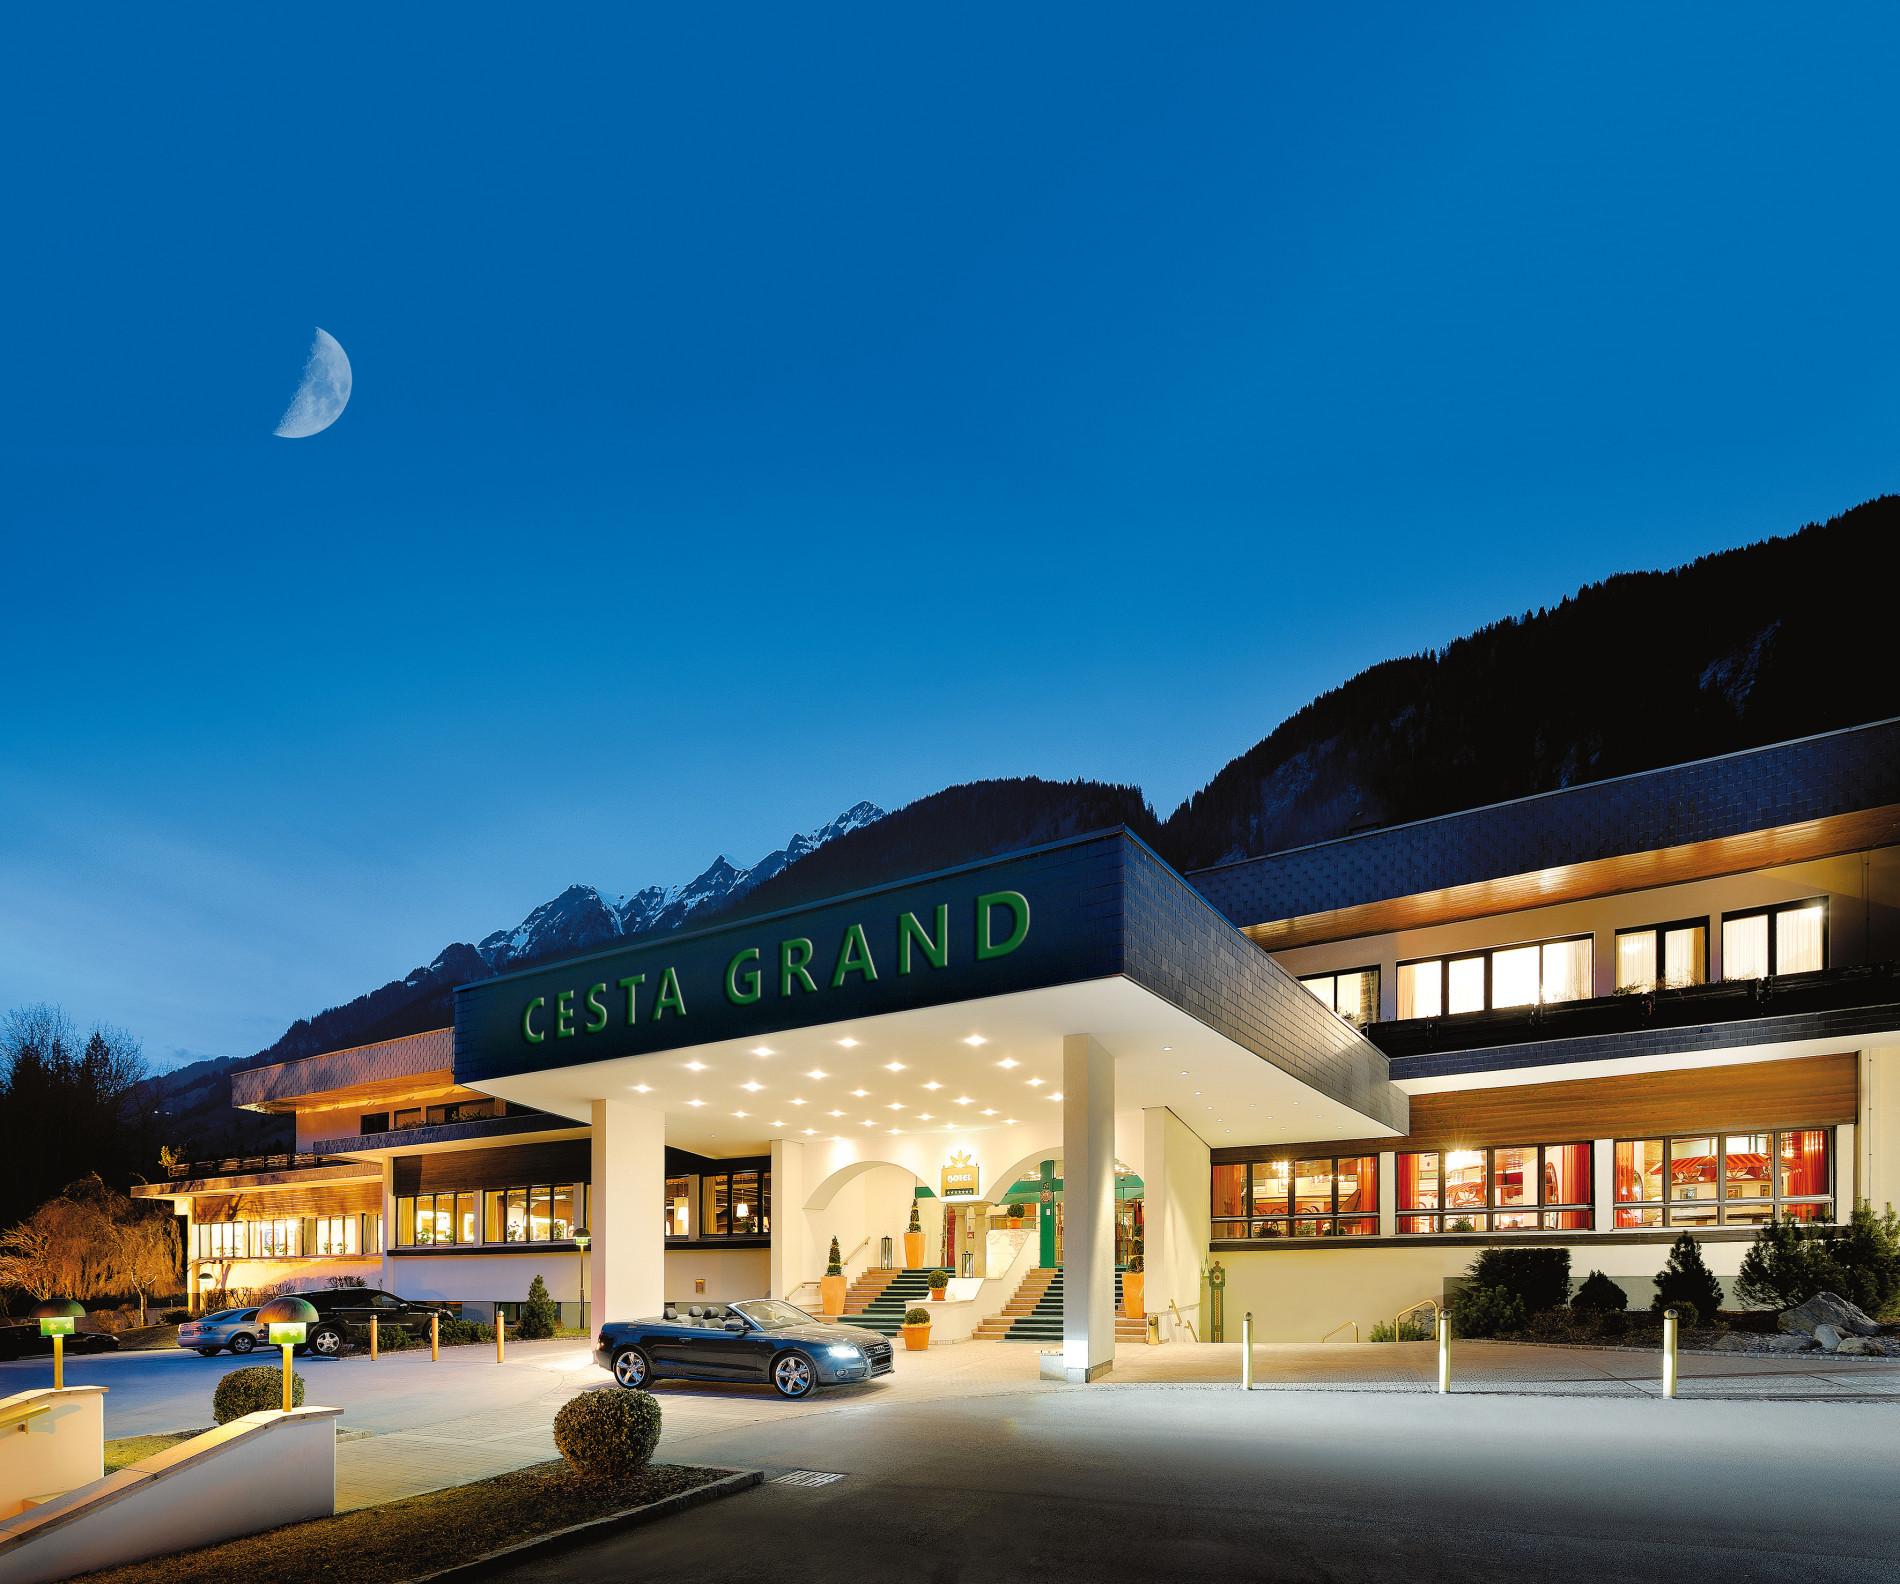 Hotel Cesta Grand